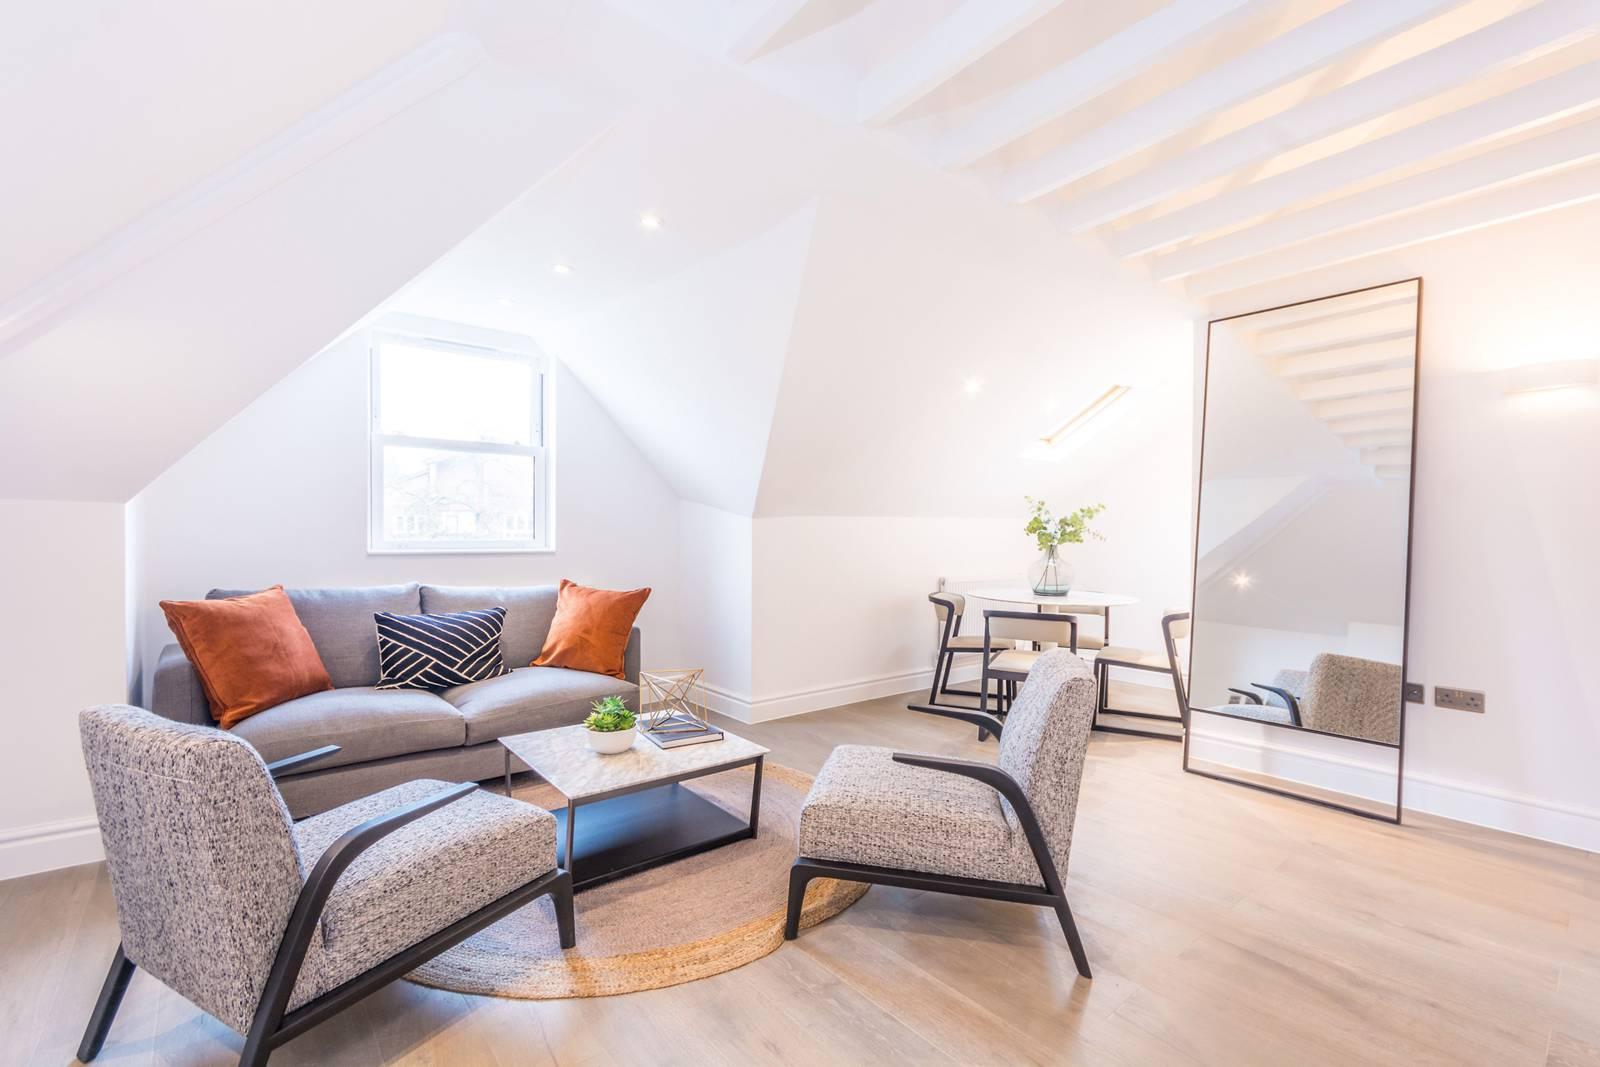 1 Bedroom Flat For Sale In Thurlow Park Road West Dulwich Se21 London